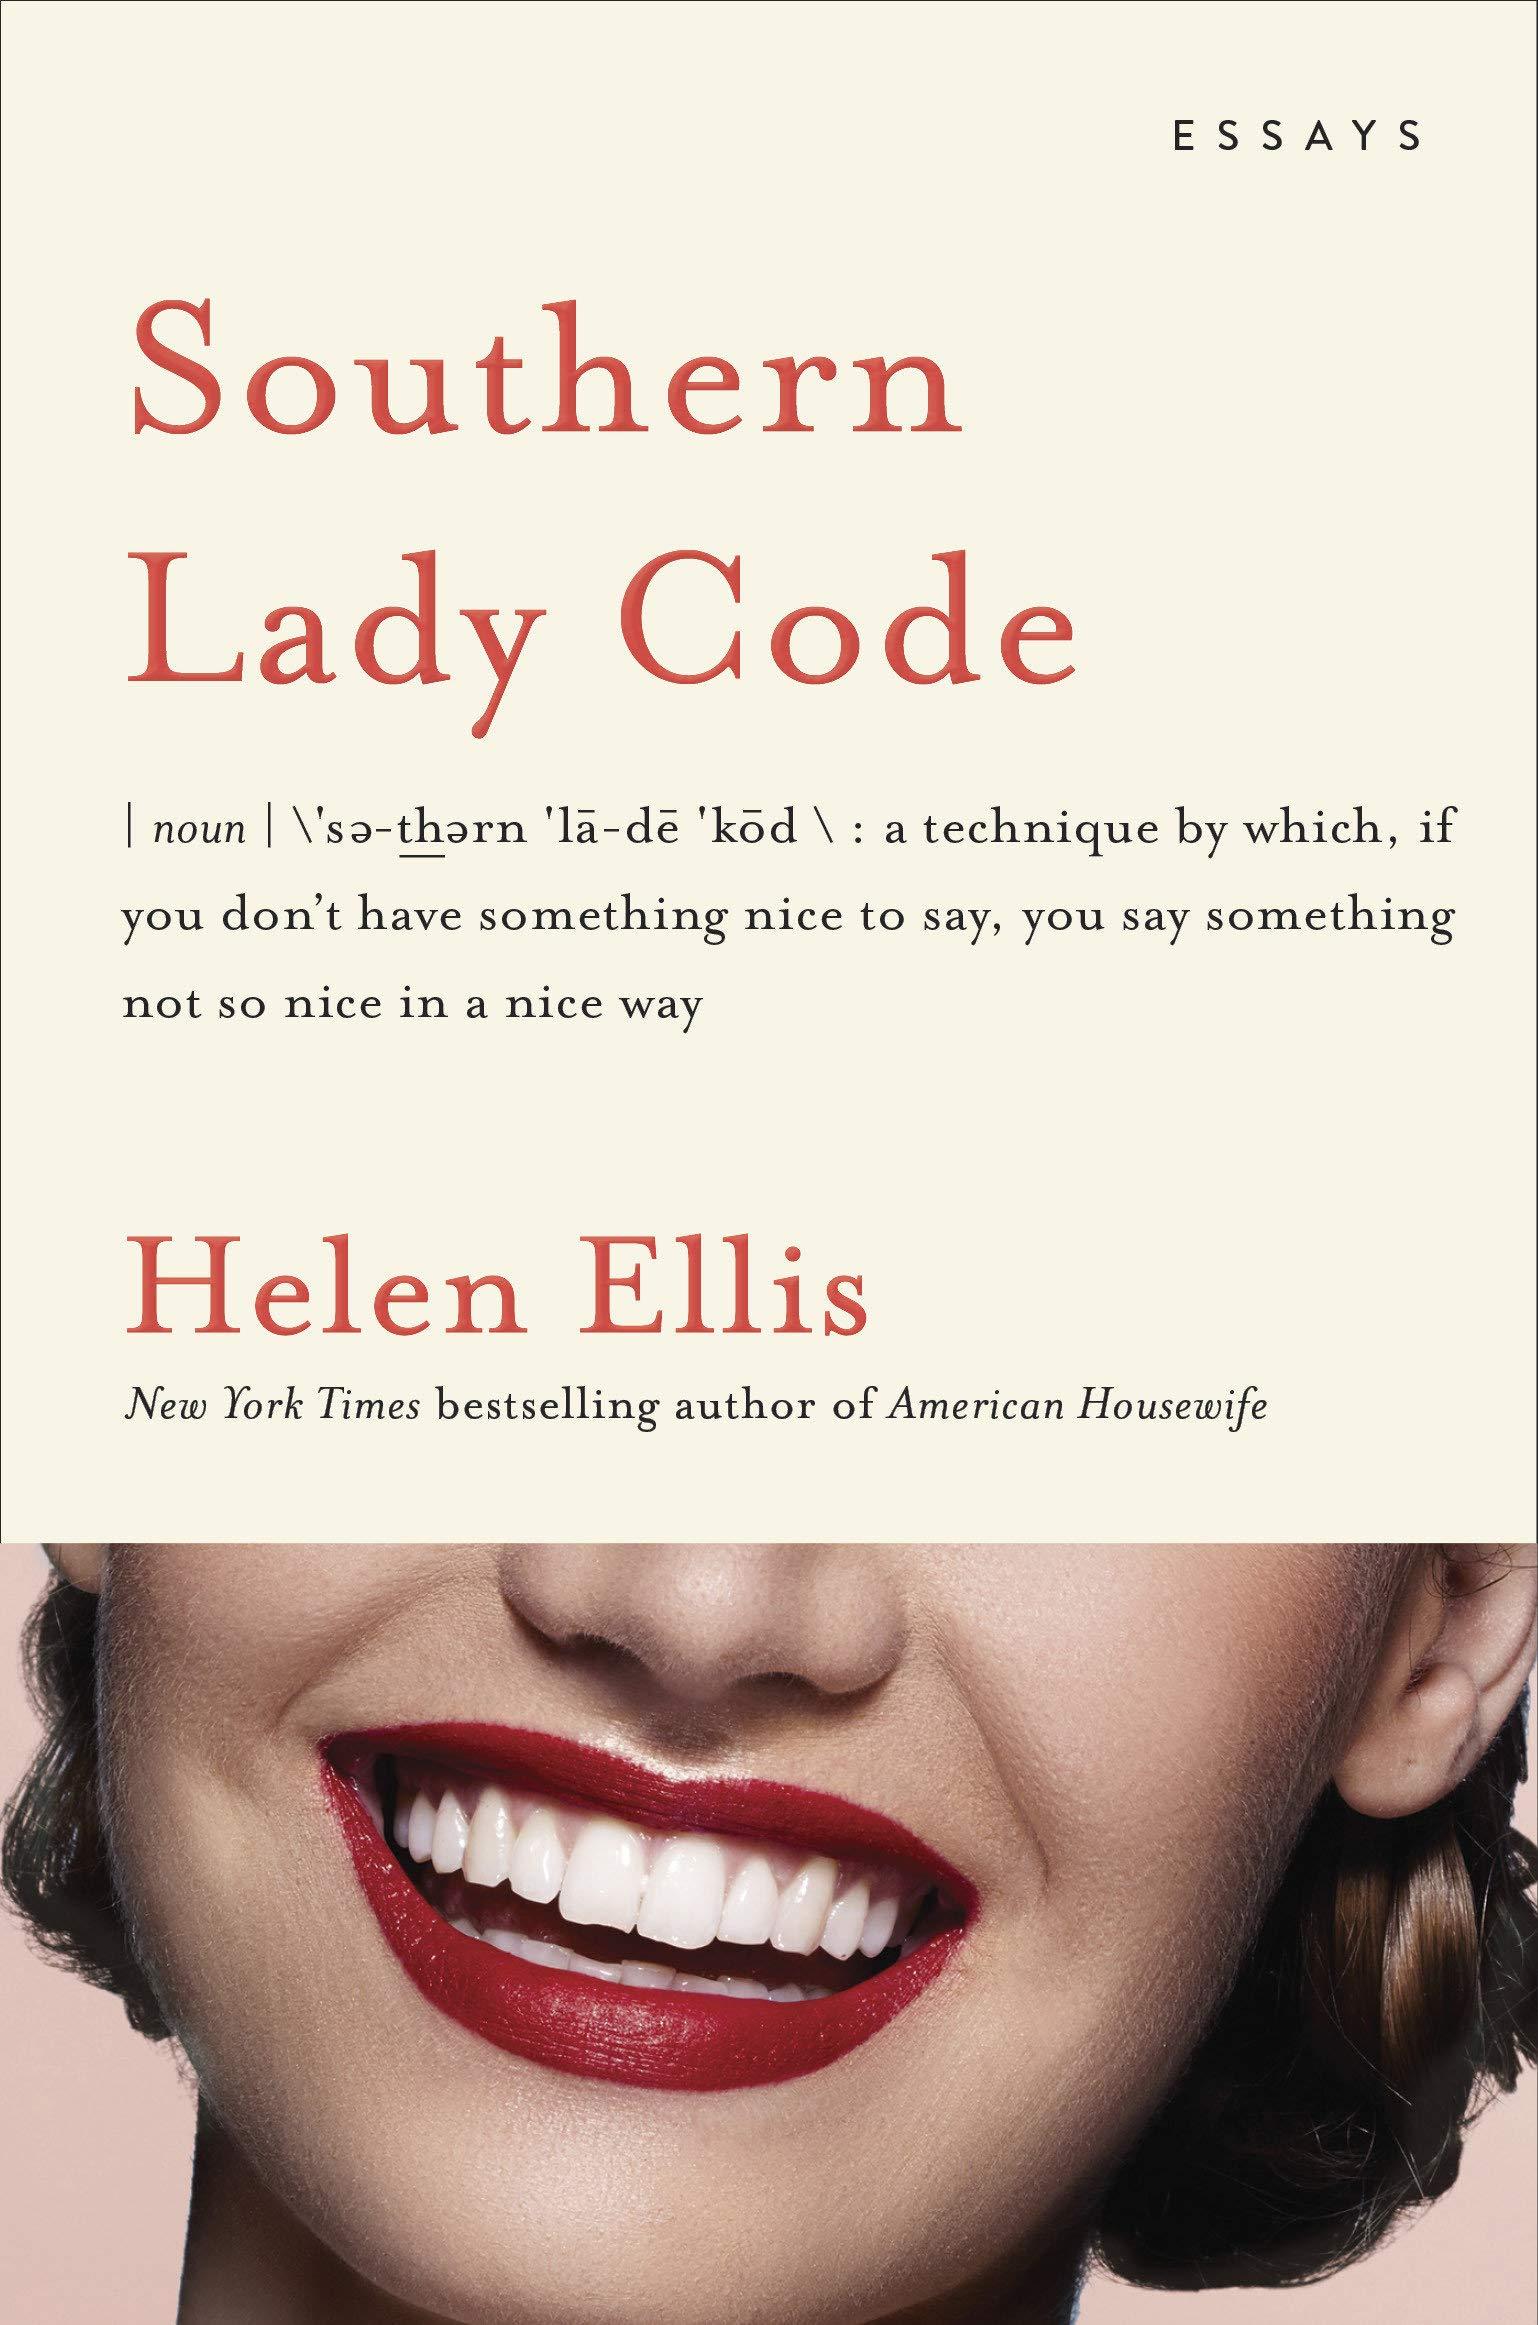 Southern Lady Code: by Helen Ellis - Spectrum Culture